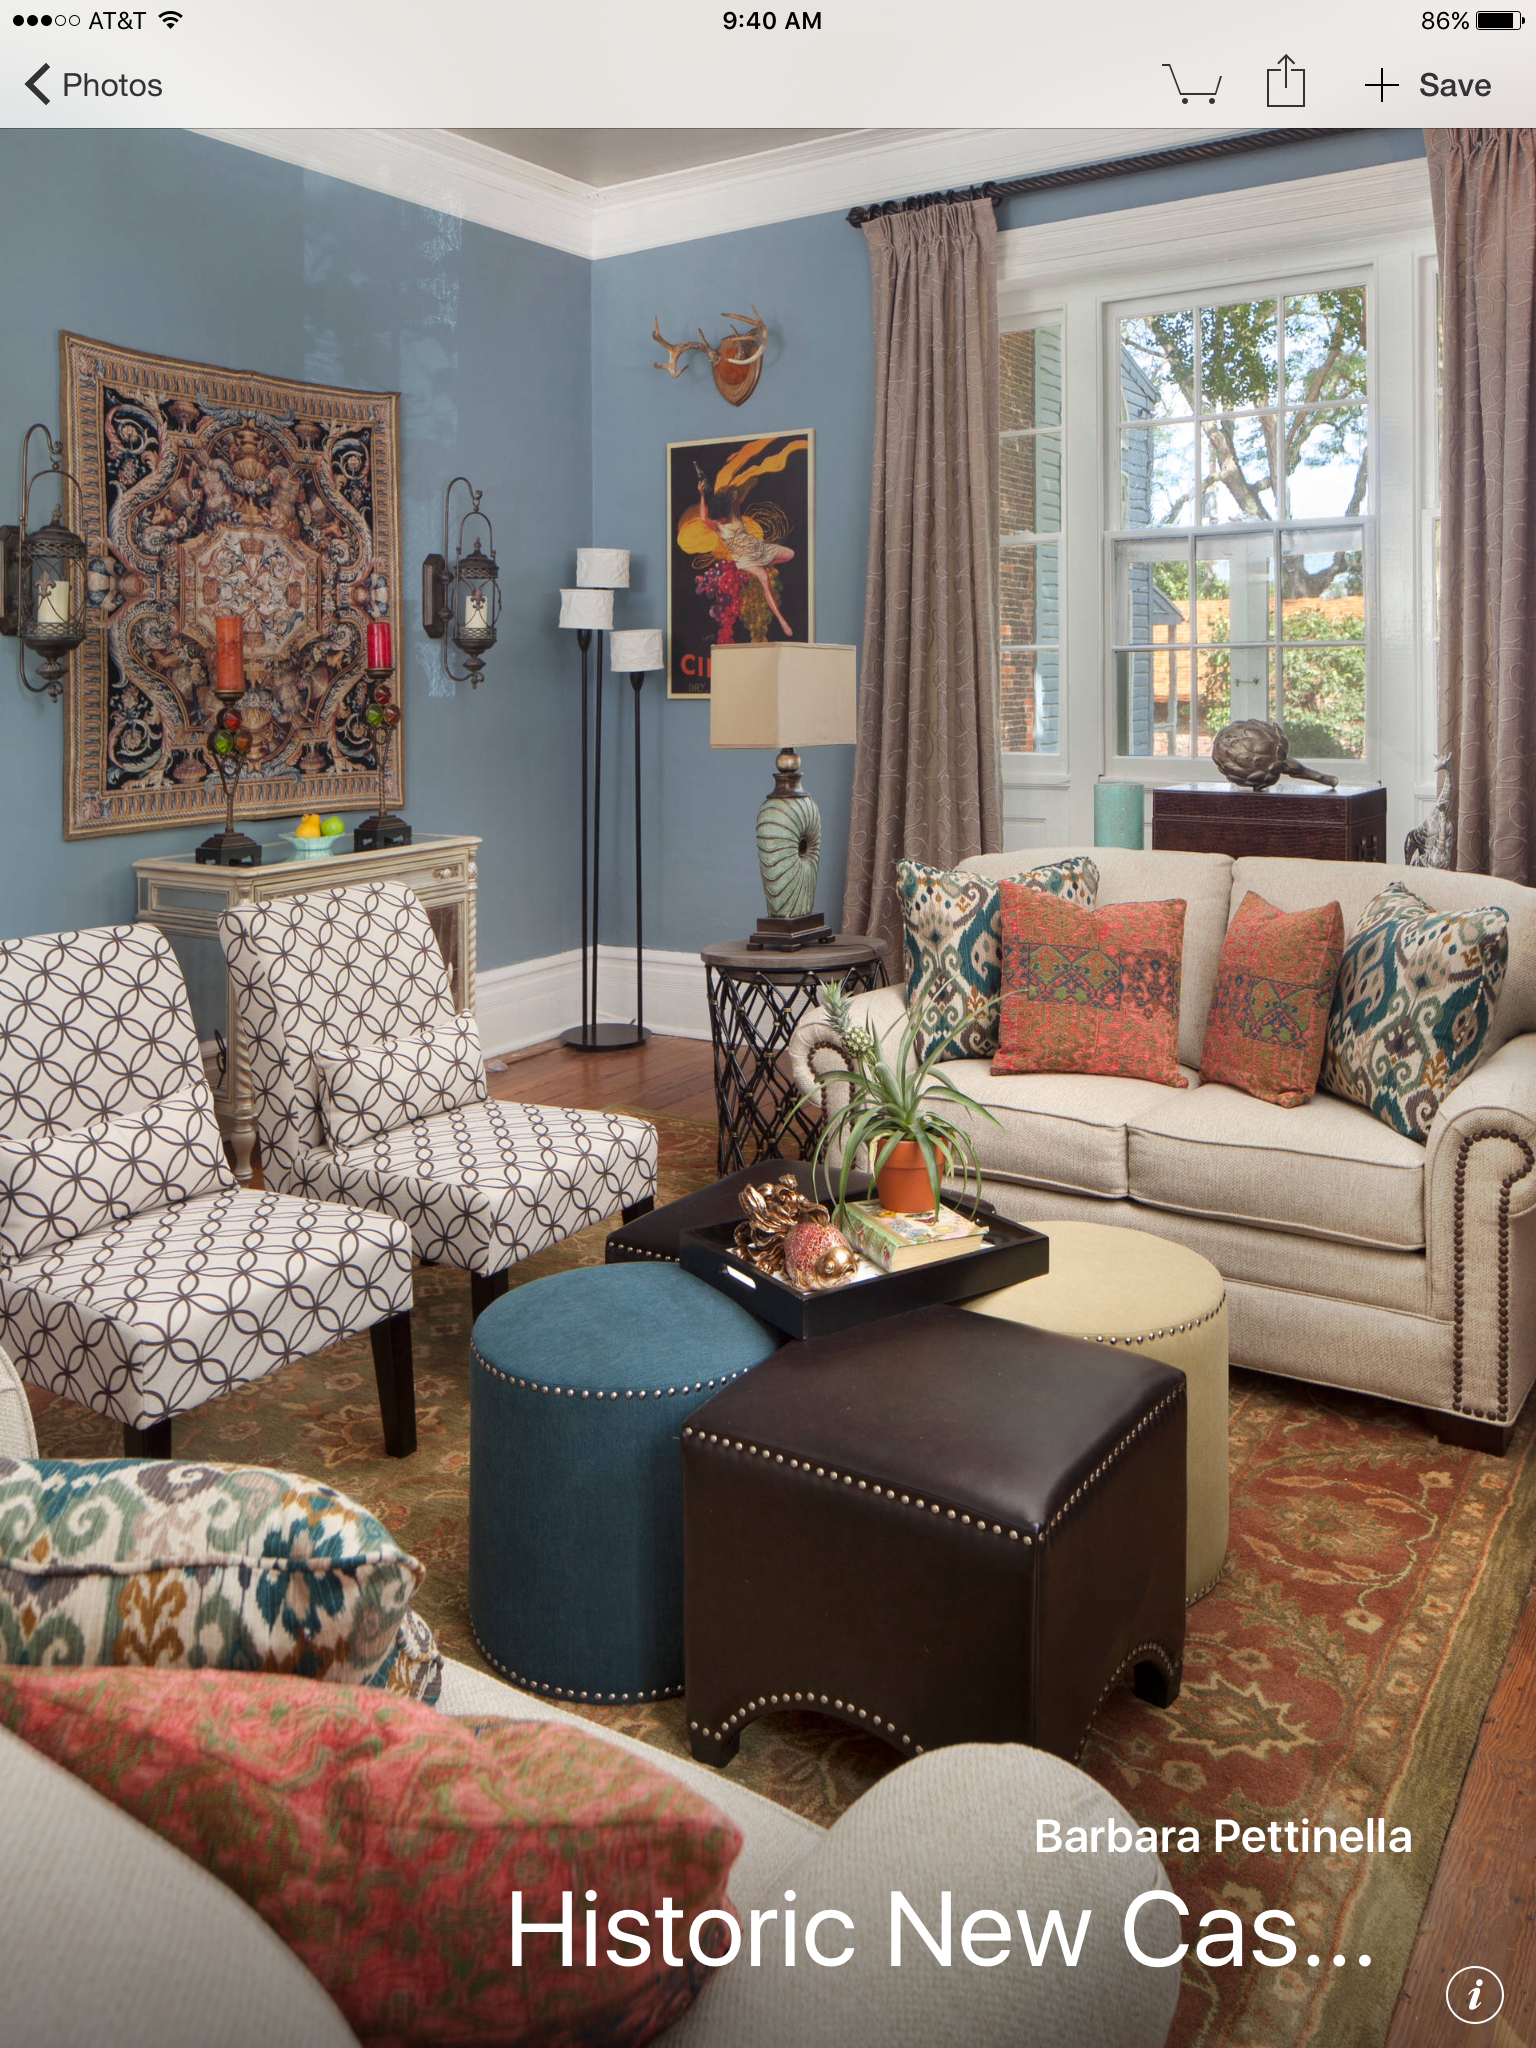 Home interior design drawing room pin by linda byron on interior decorating  pinterest  interior